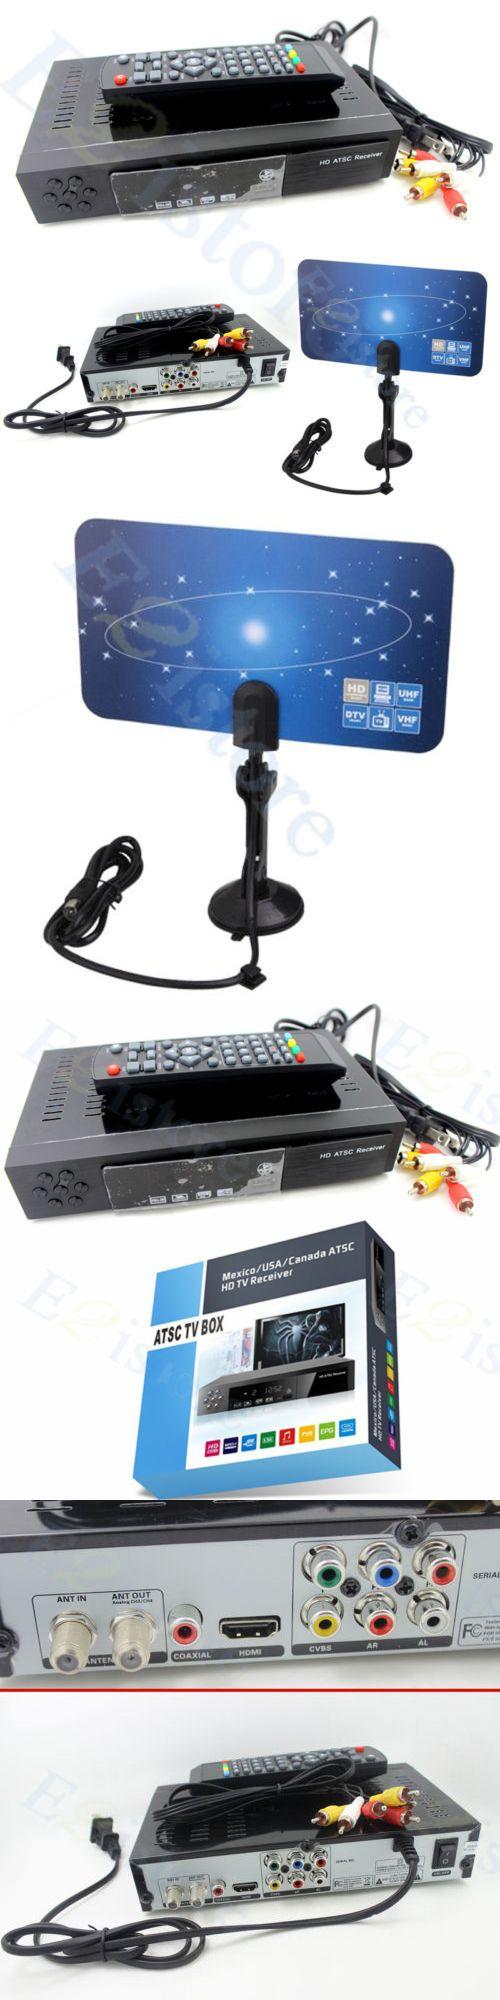 Antennas and Dishes: Full Hdmi Vhf Uhf Antenna + Atsc Tv Box Digital Analog Convertor Receiver Signal -> BUY IT NOW ONLY: $32.29 on eBay!